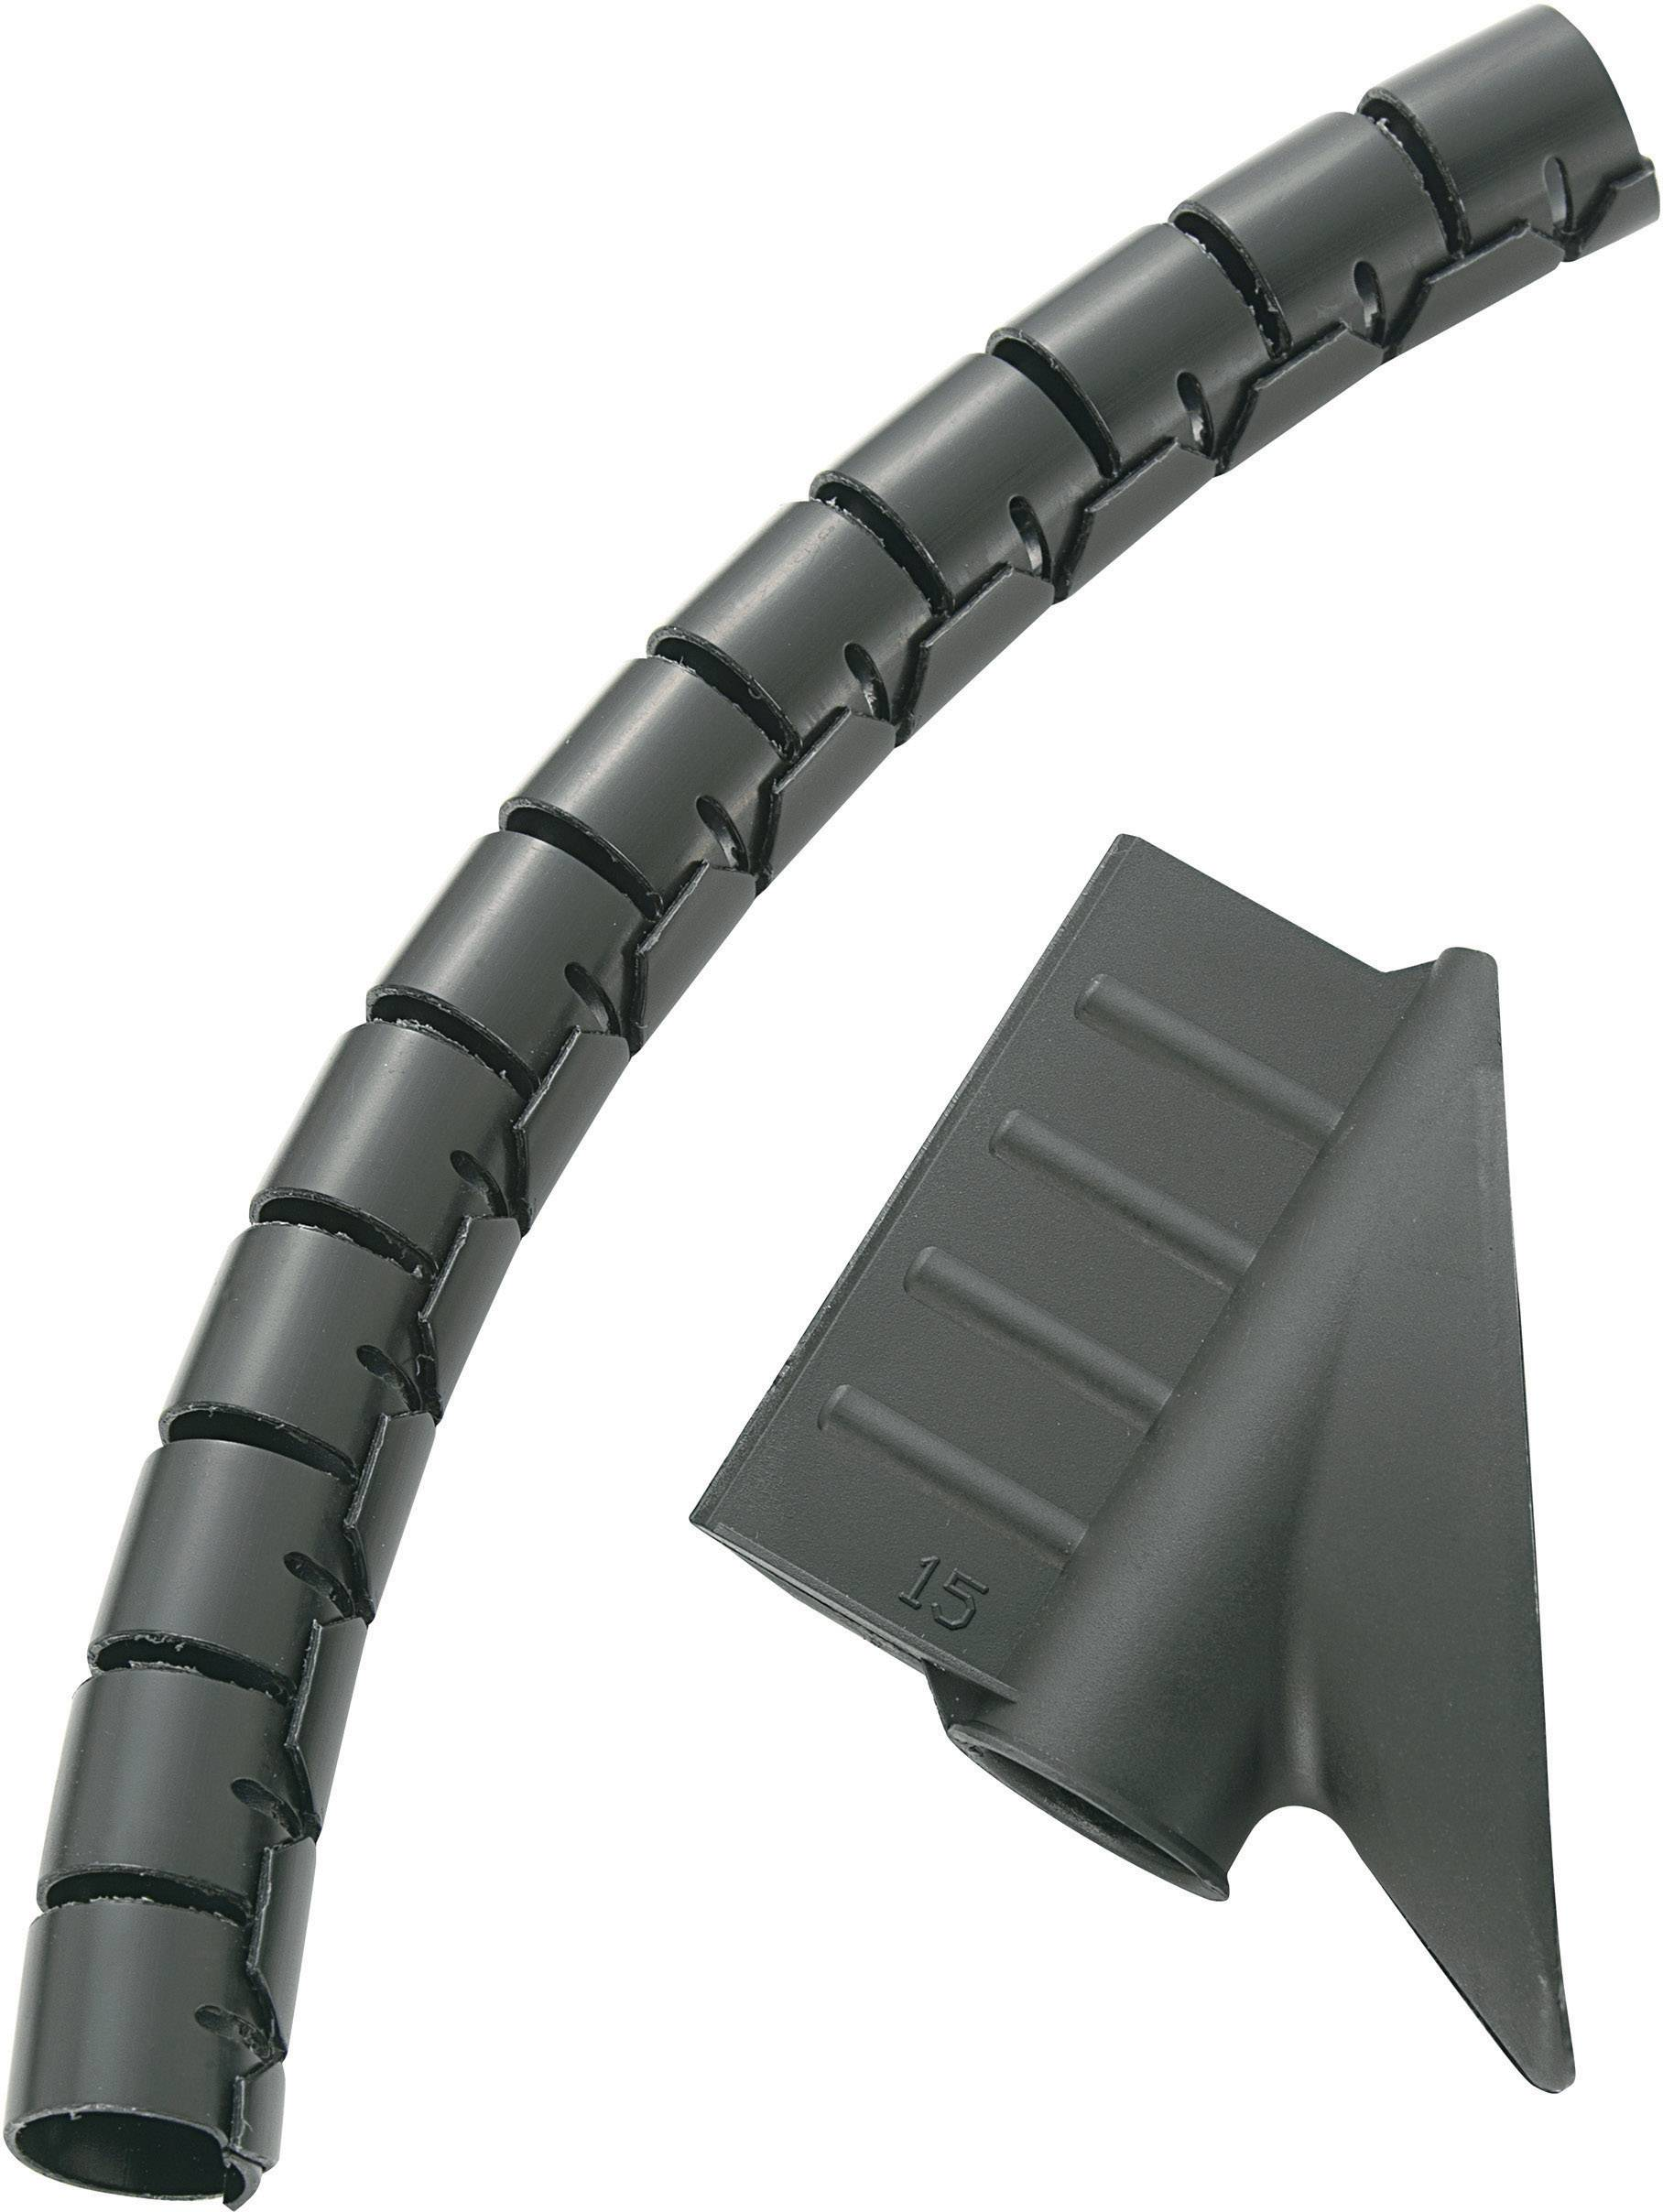 Spirálová trubice na kabely KSS MX-KLT8WE (28530c1026), 10 mm, bílá